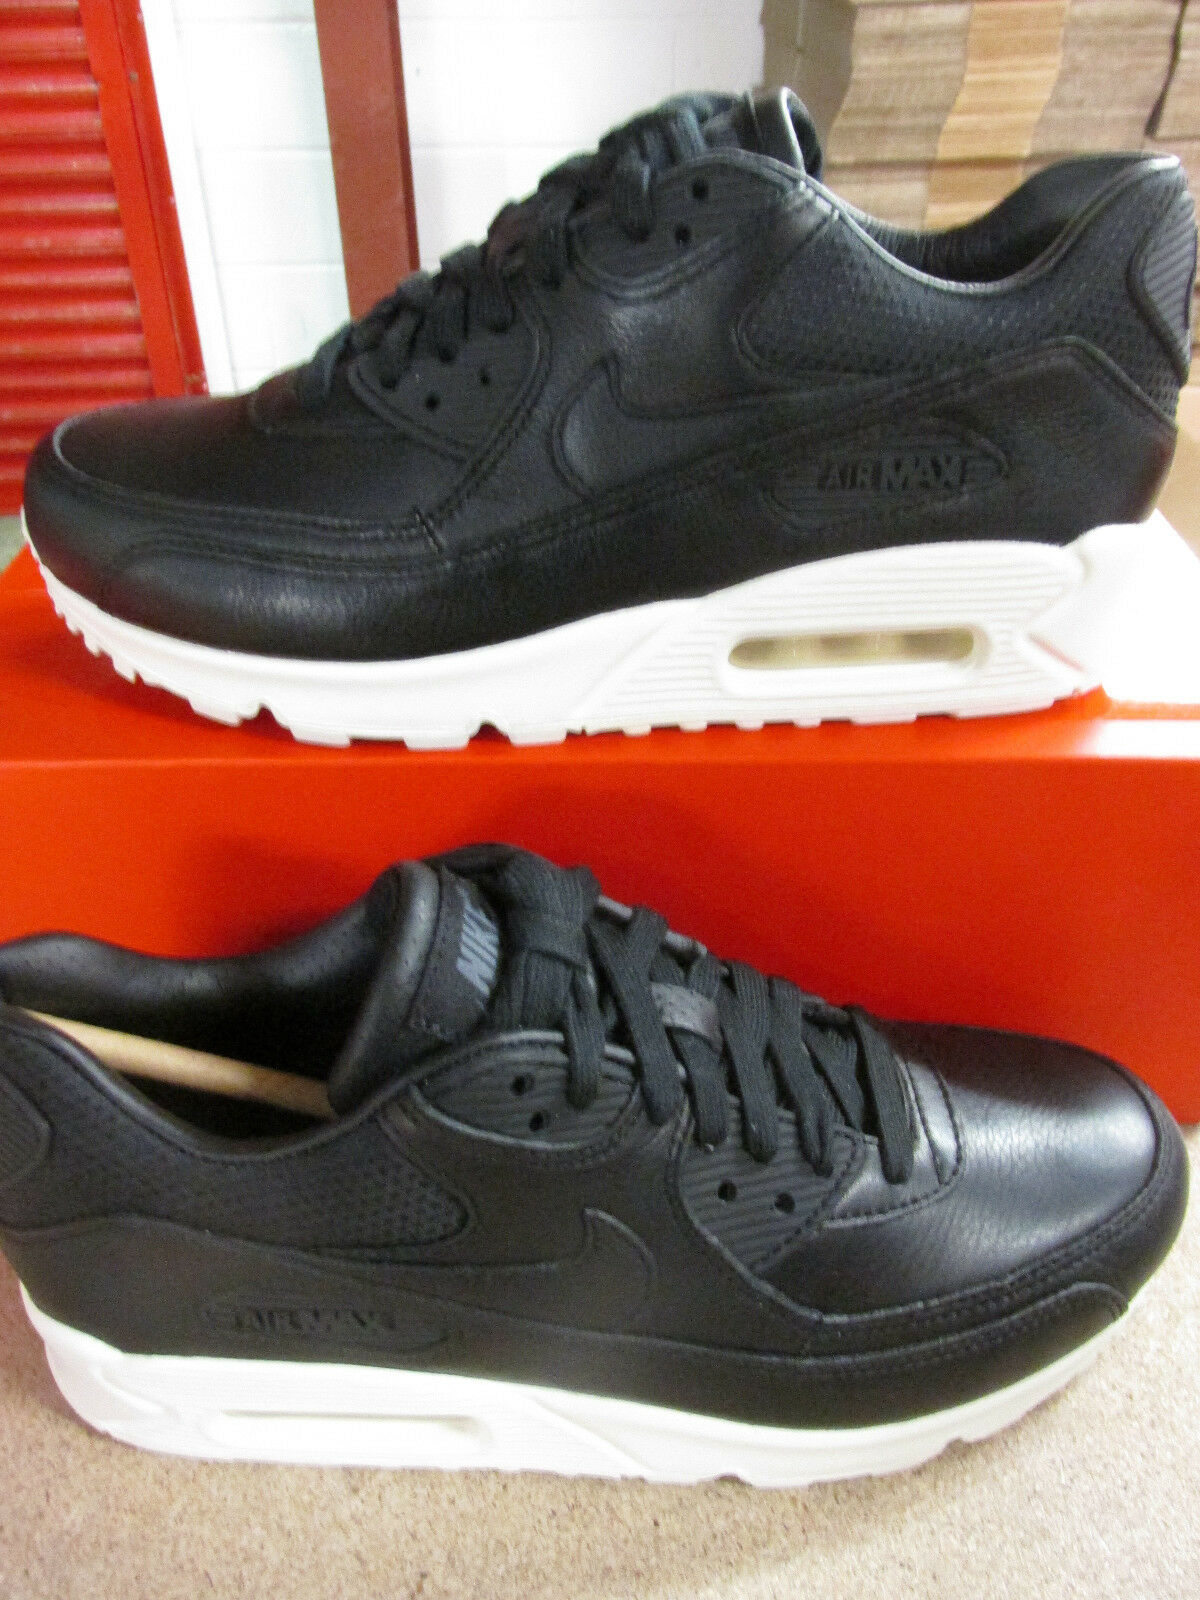 Nike femmes Air Max 90 Pinnacle Running Trainers 839612 002 Sneakers Chaussures